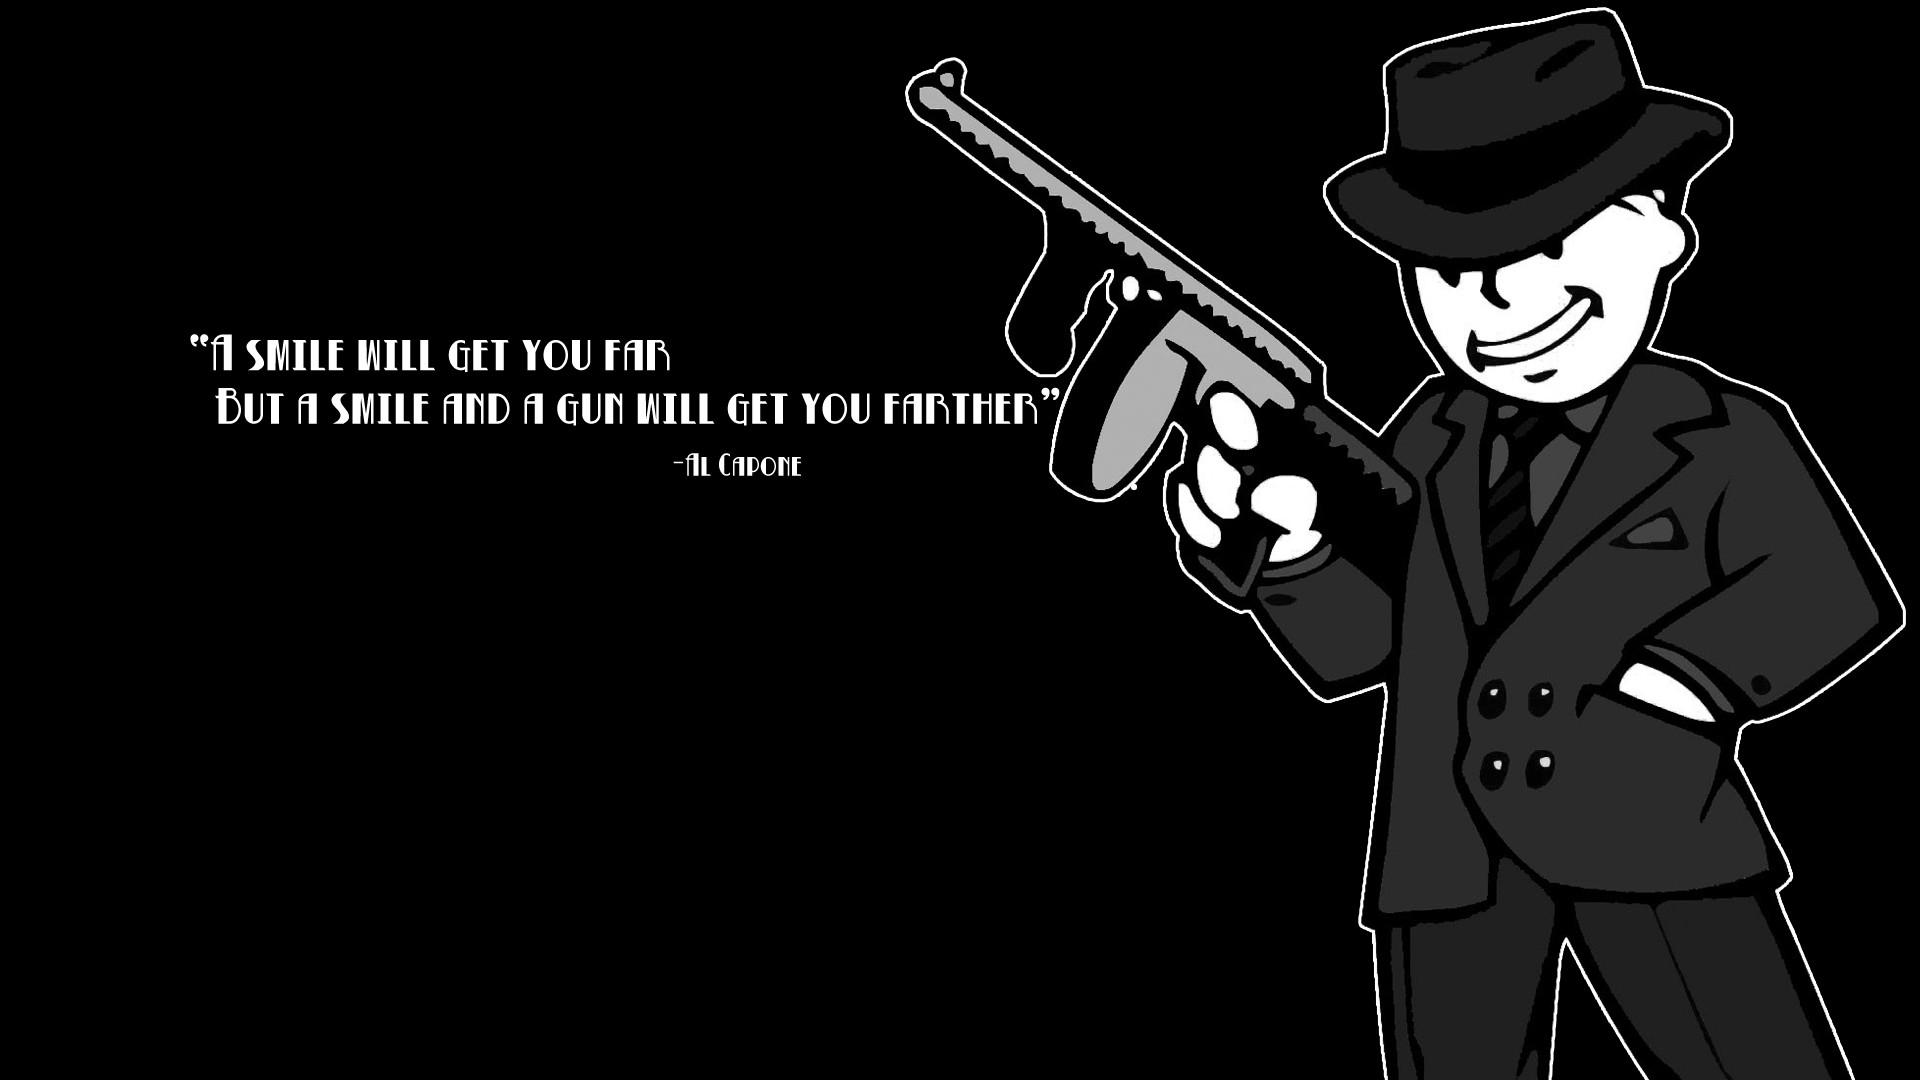 Fallout Quotes Wallpaper Fallout, Quotes, Al, Capone